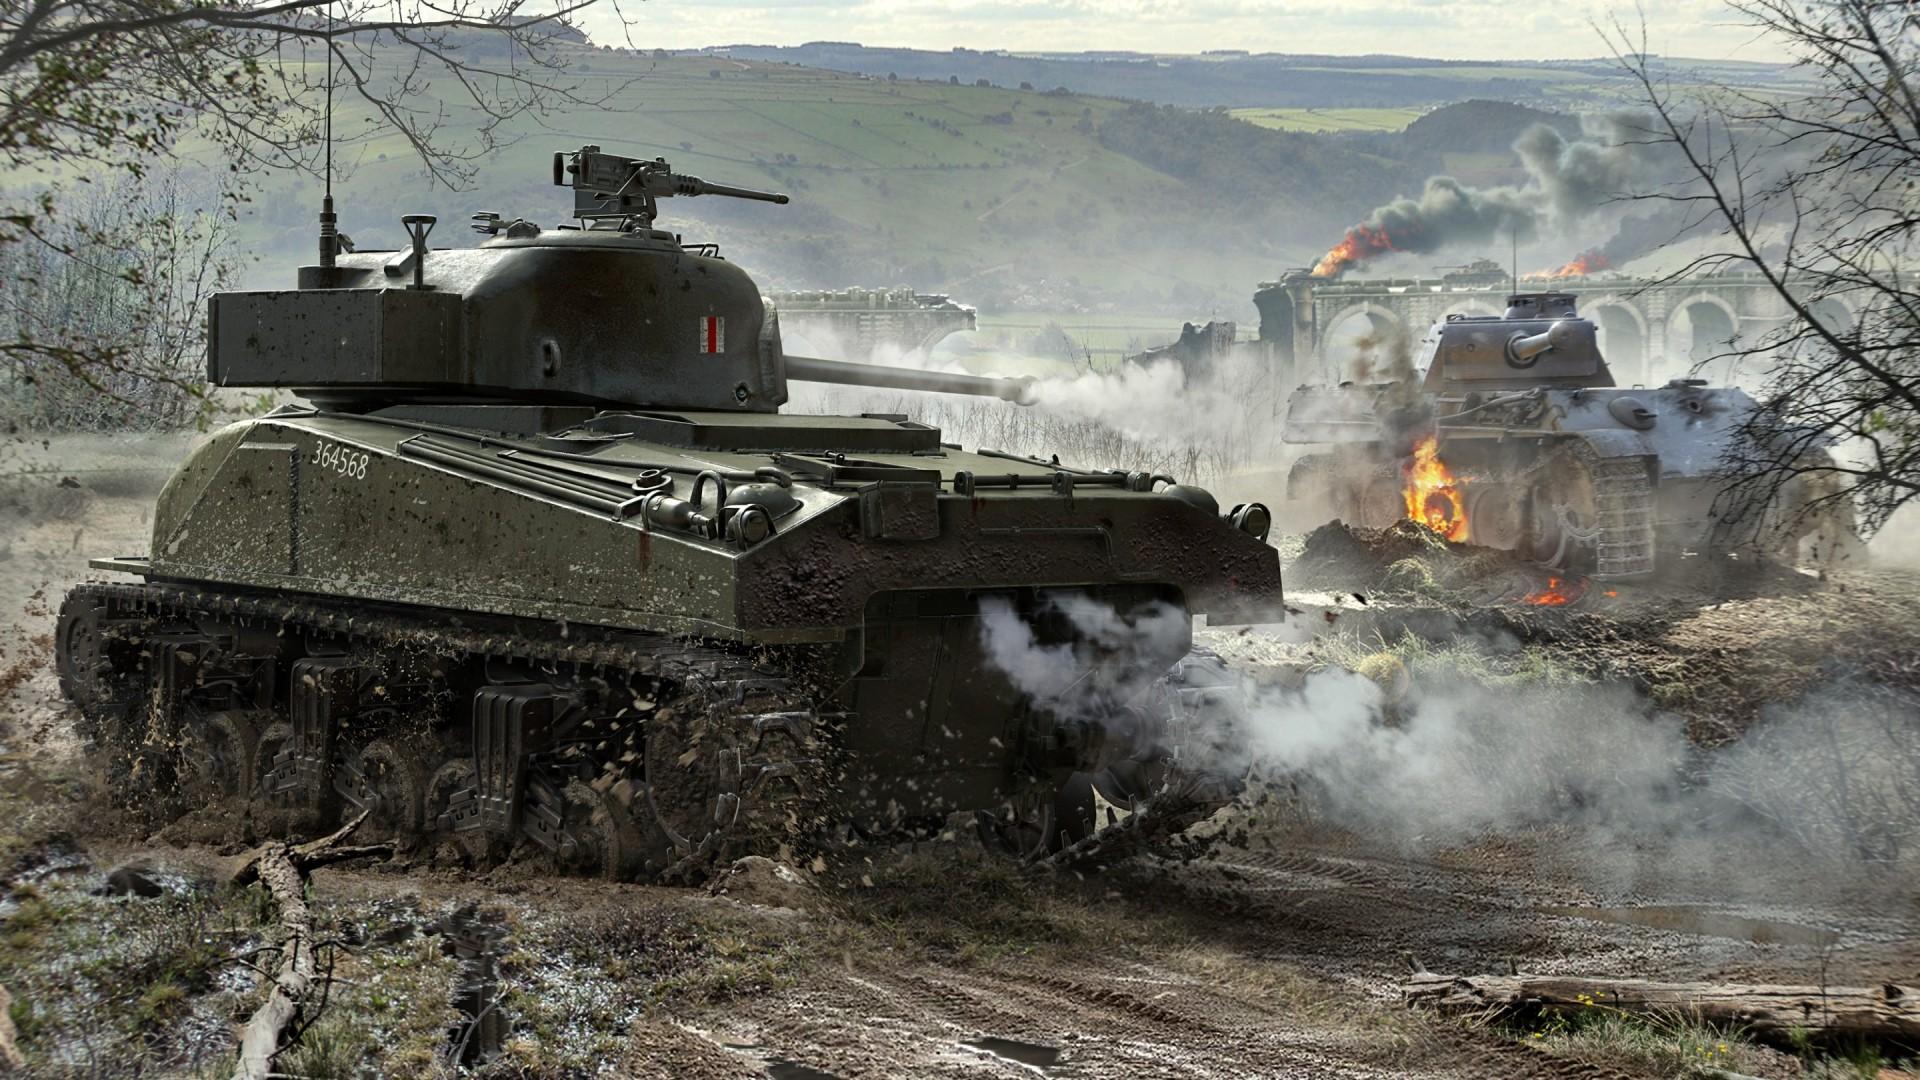 Res: 1920x1080, Score Bonus World of Tanks Gold Through Amazon Payments